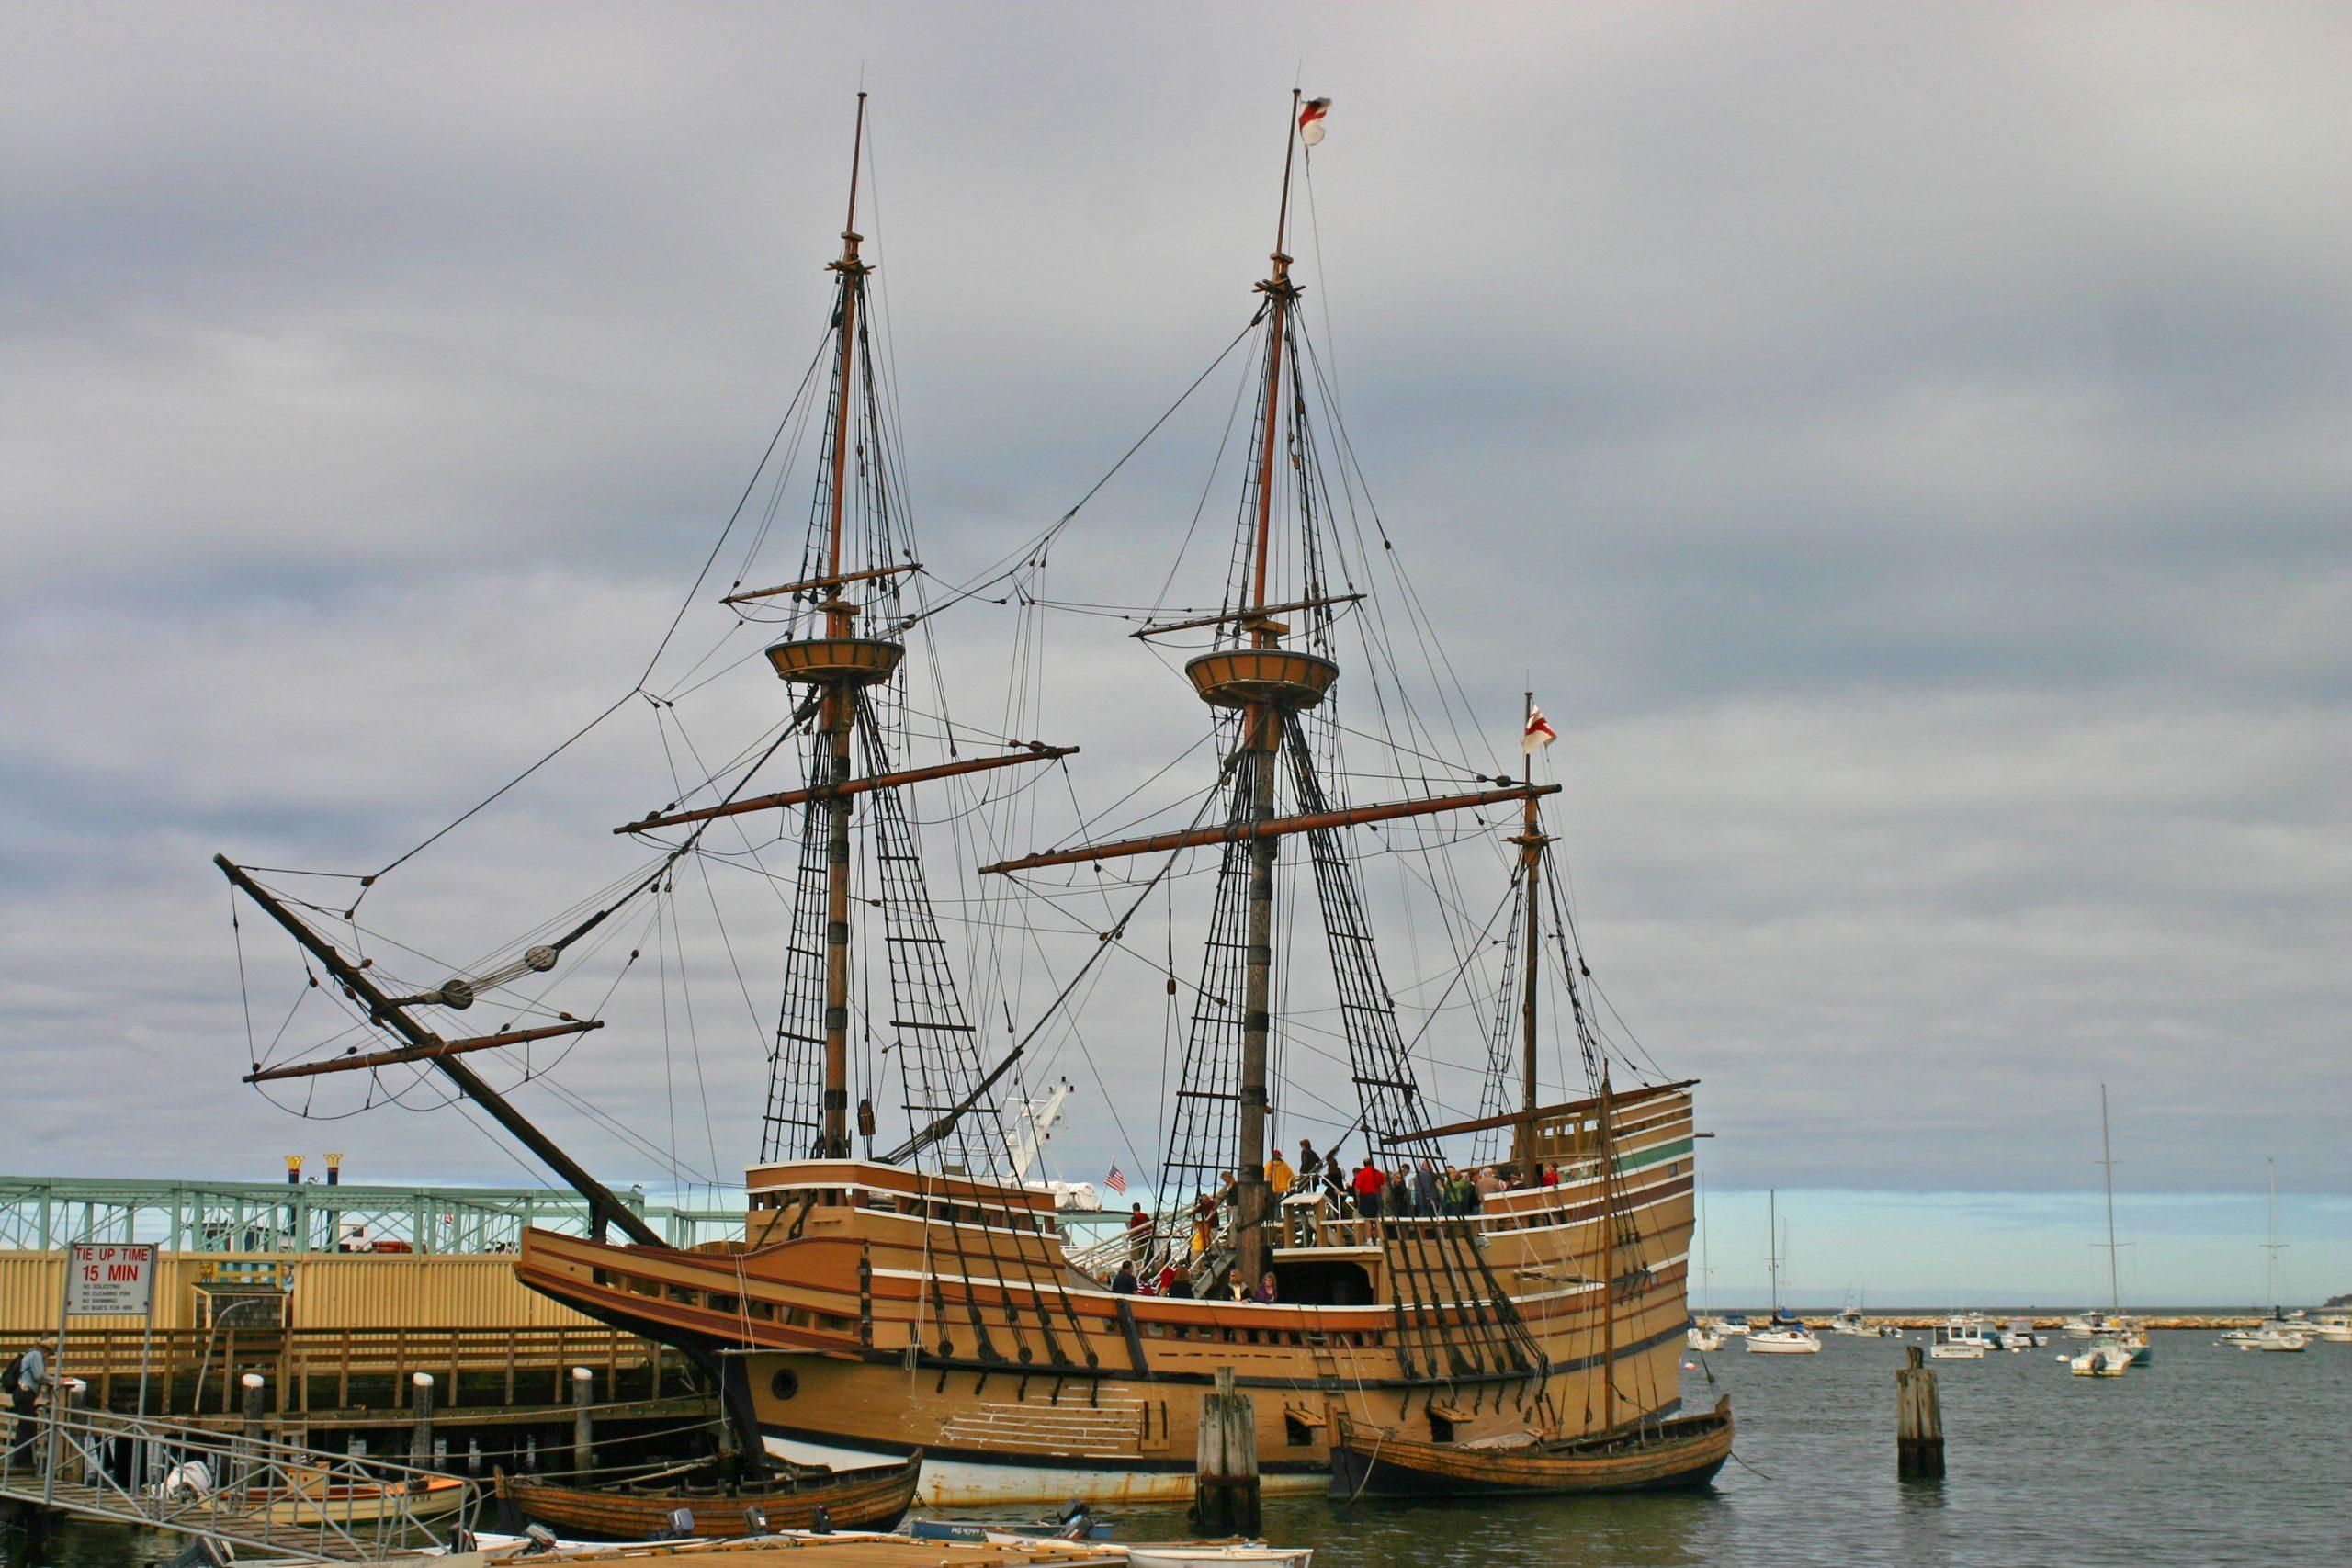 Mayflower reproduction